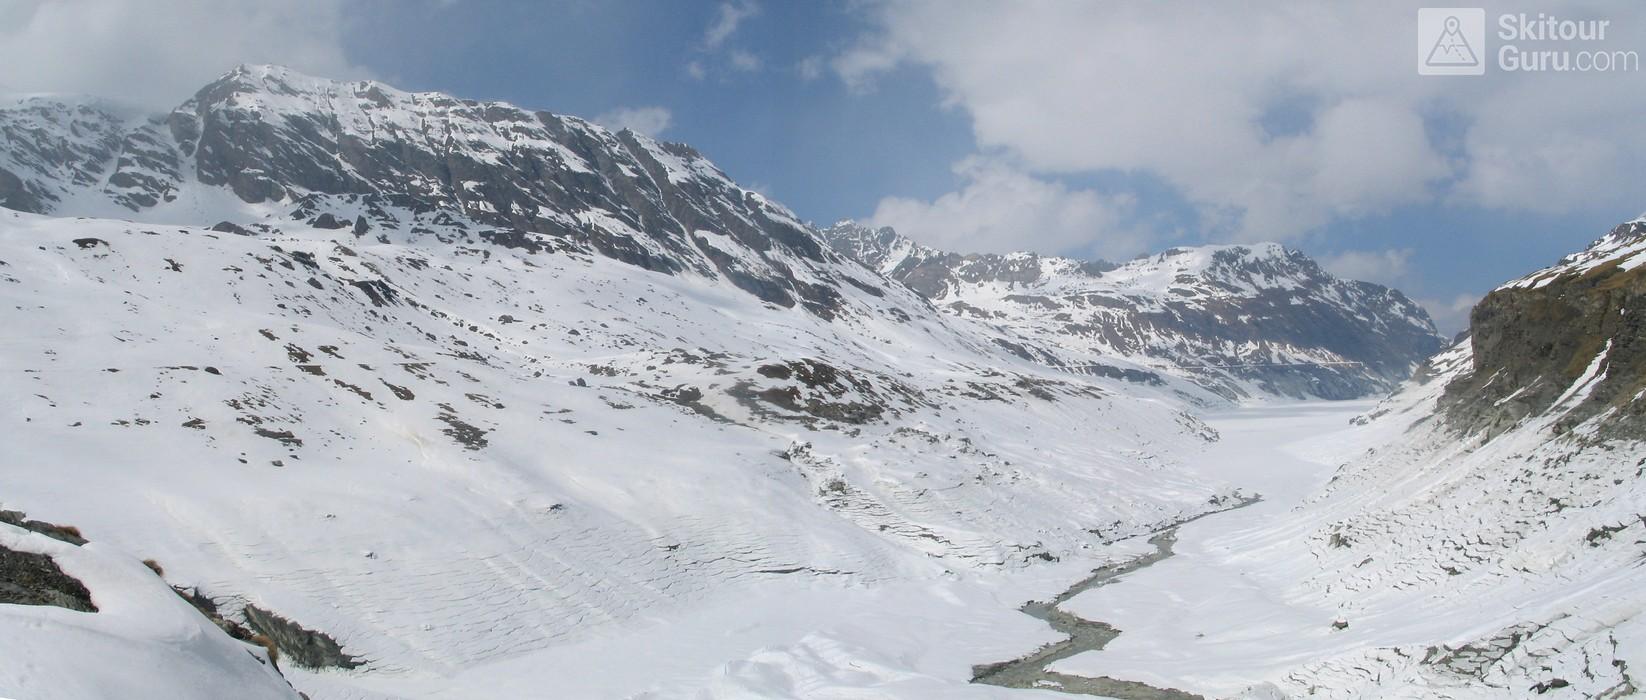 Cabane des Dix Walliser Alpen / Alpes valaisannes Švýcarsko panorama 15